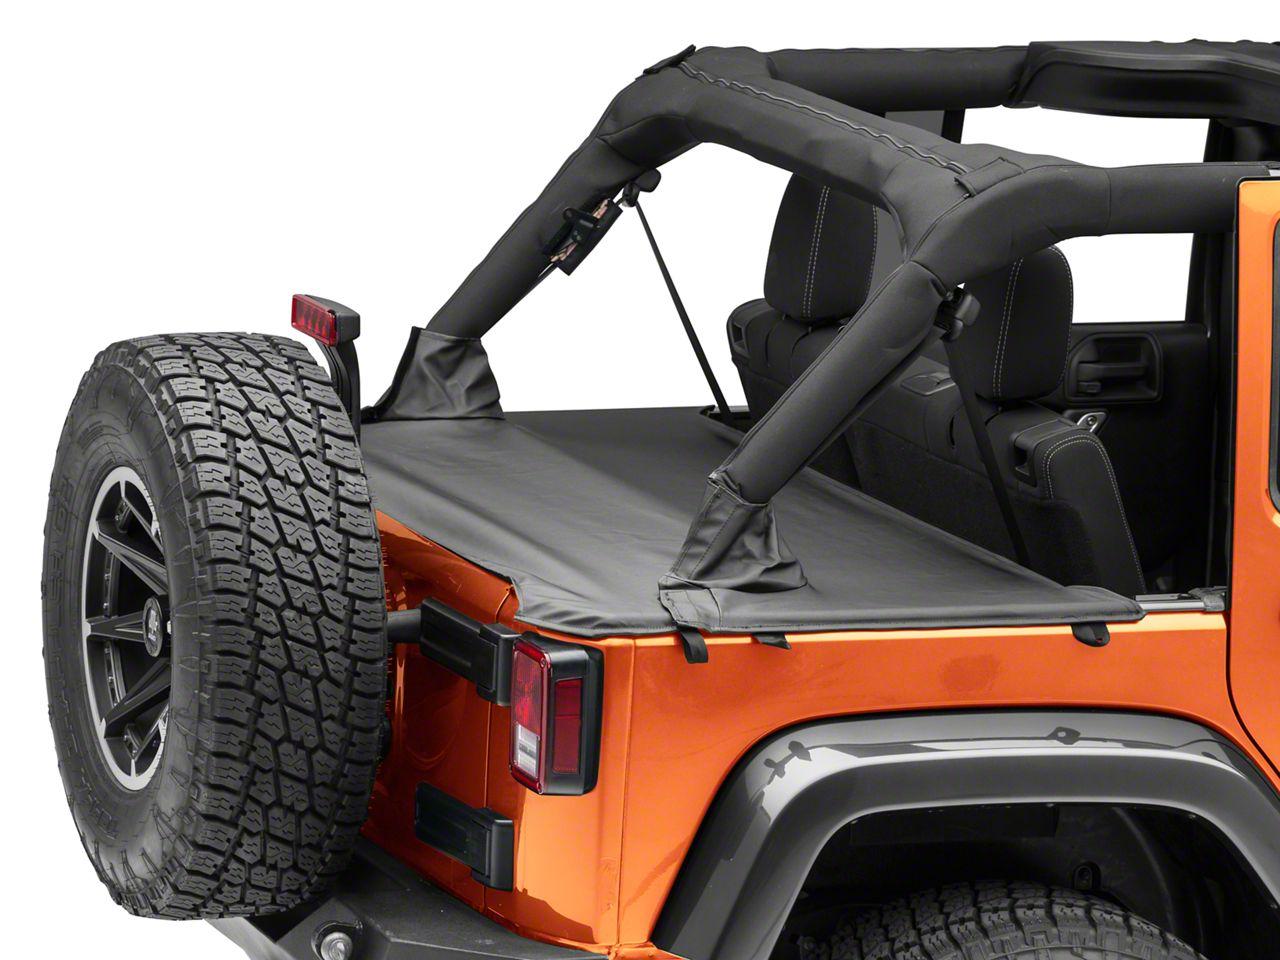 MasterTop Tonneau Cover - Black Diamond (07-18 Jeep Wrangler JK 4 Door)